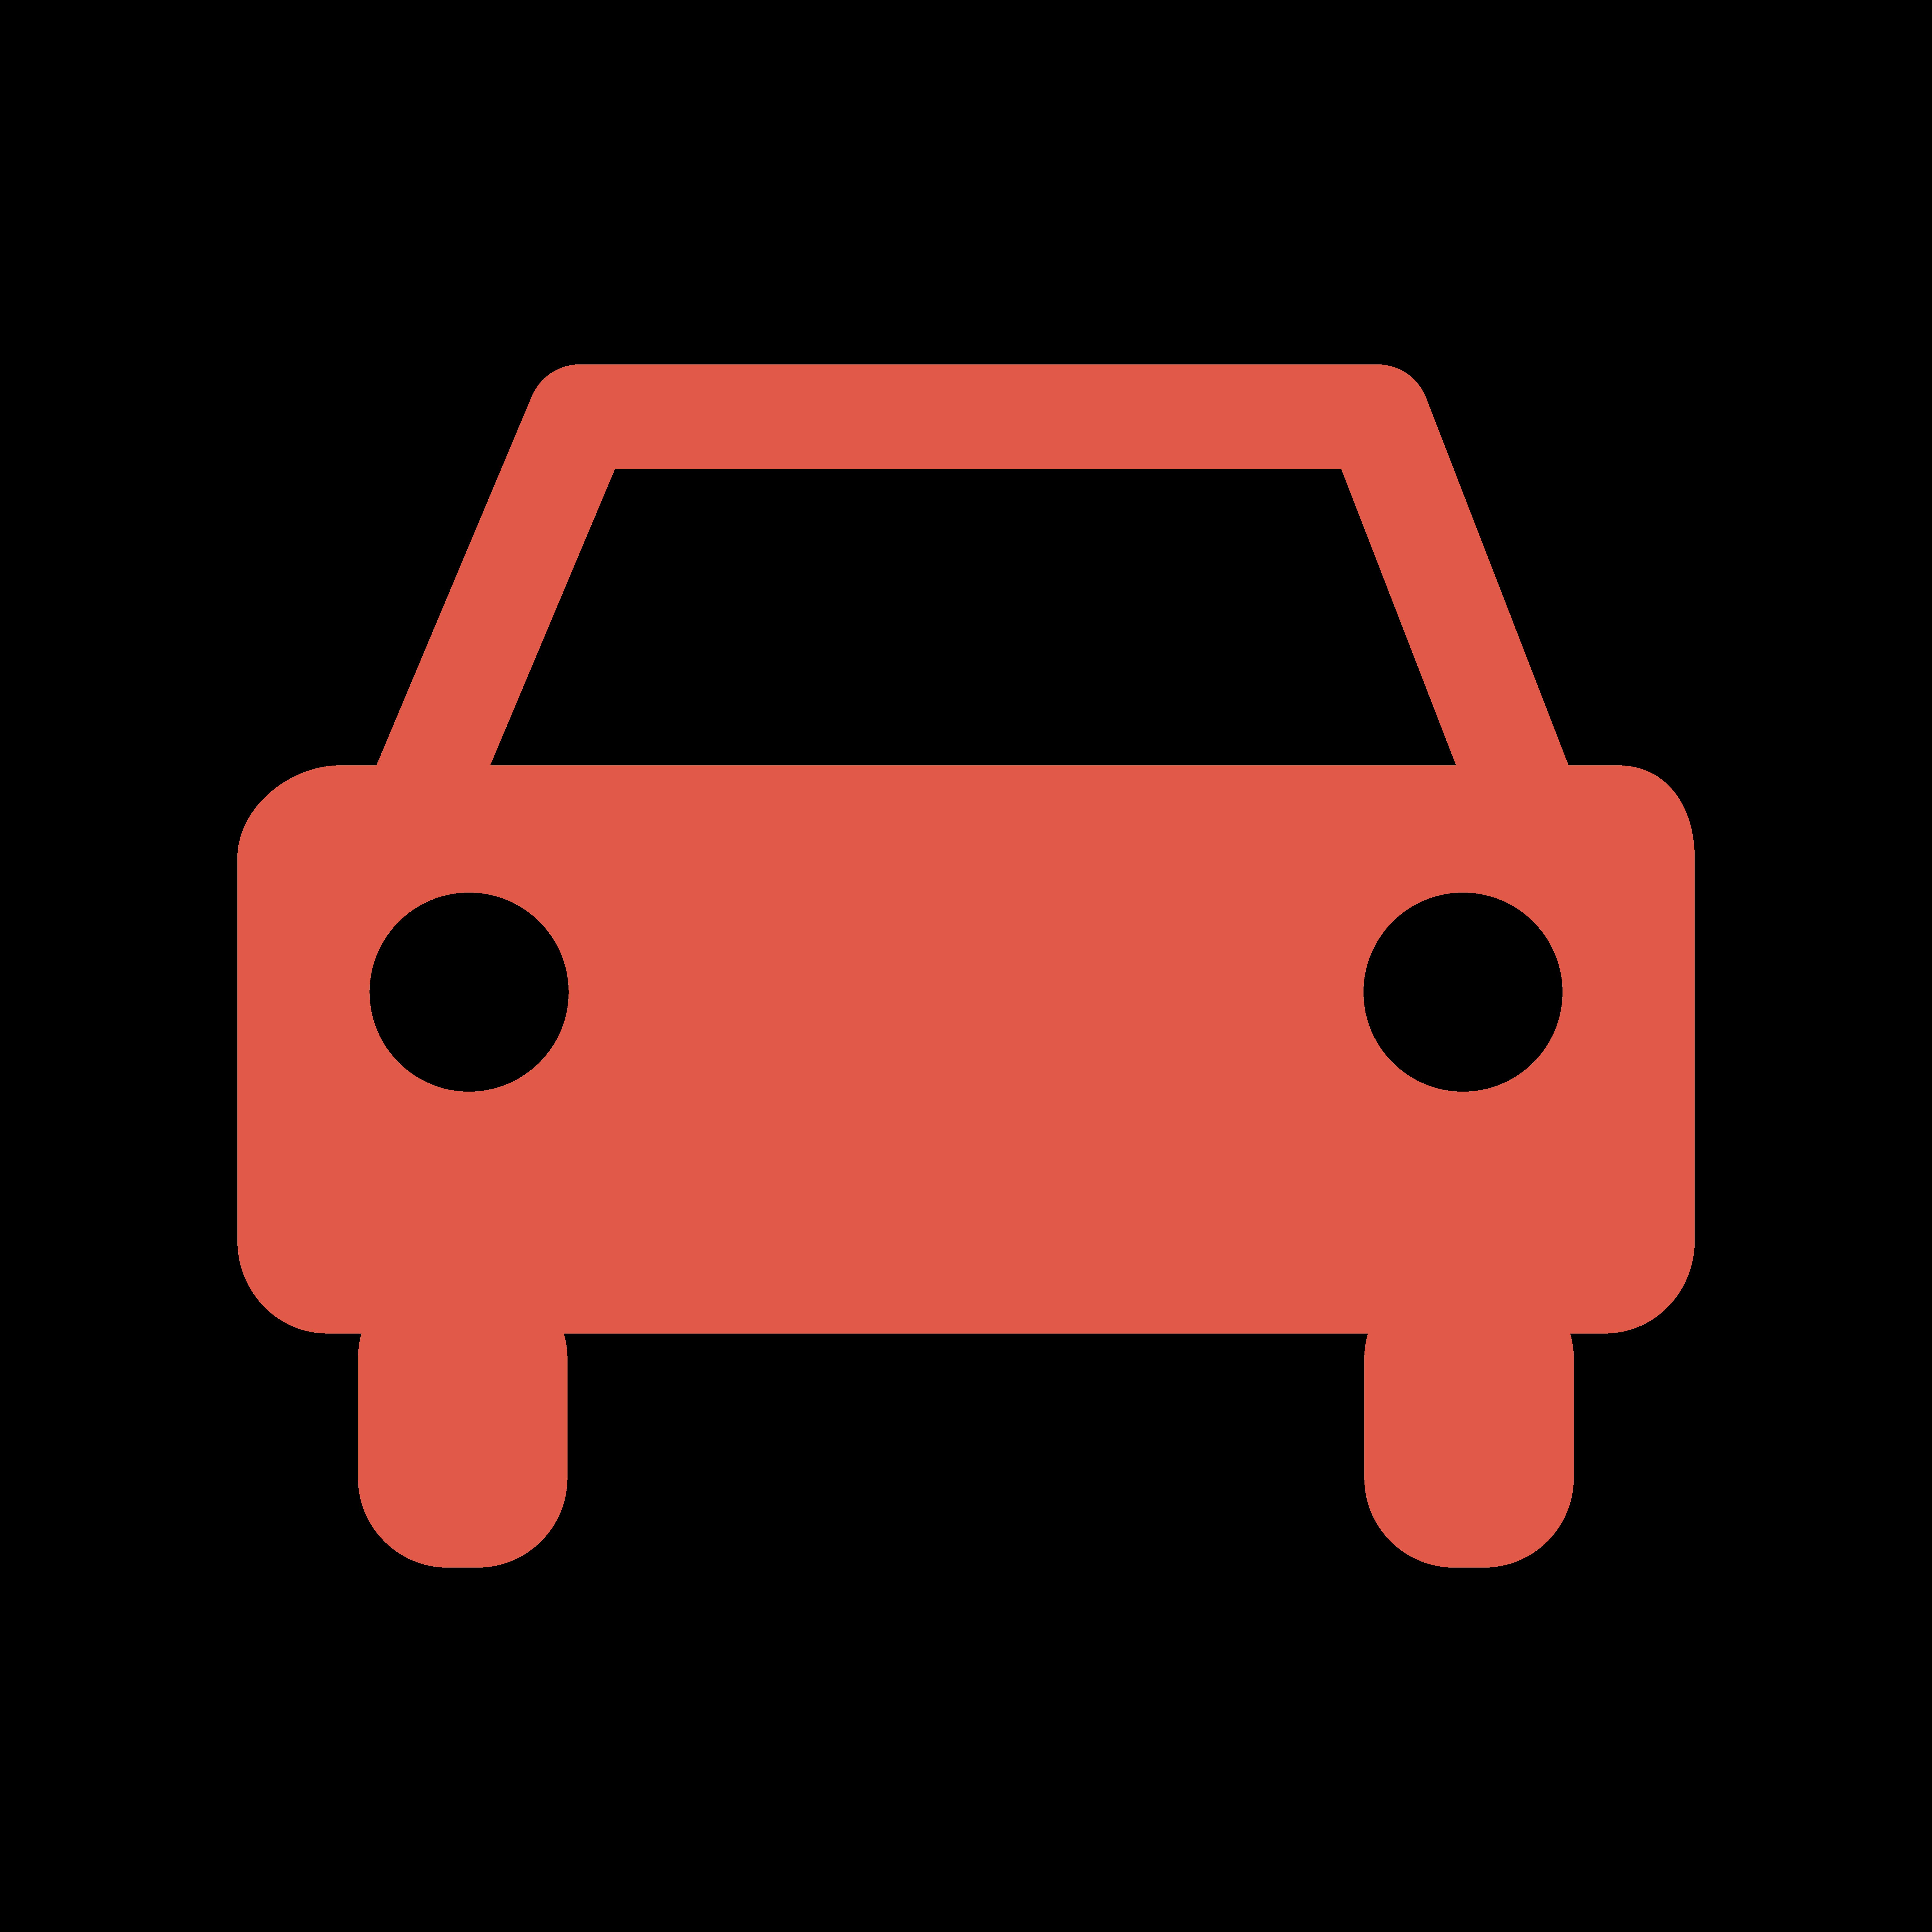 Classic Car Clipart Design 2020